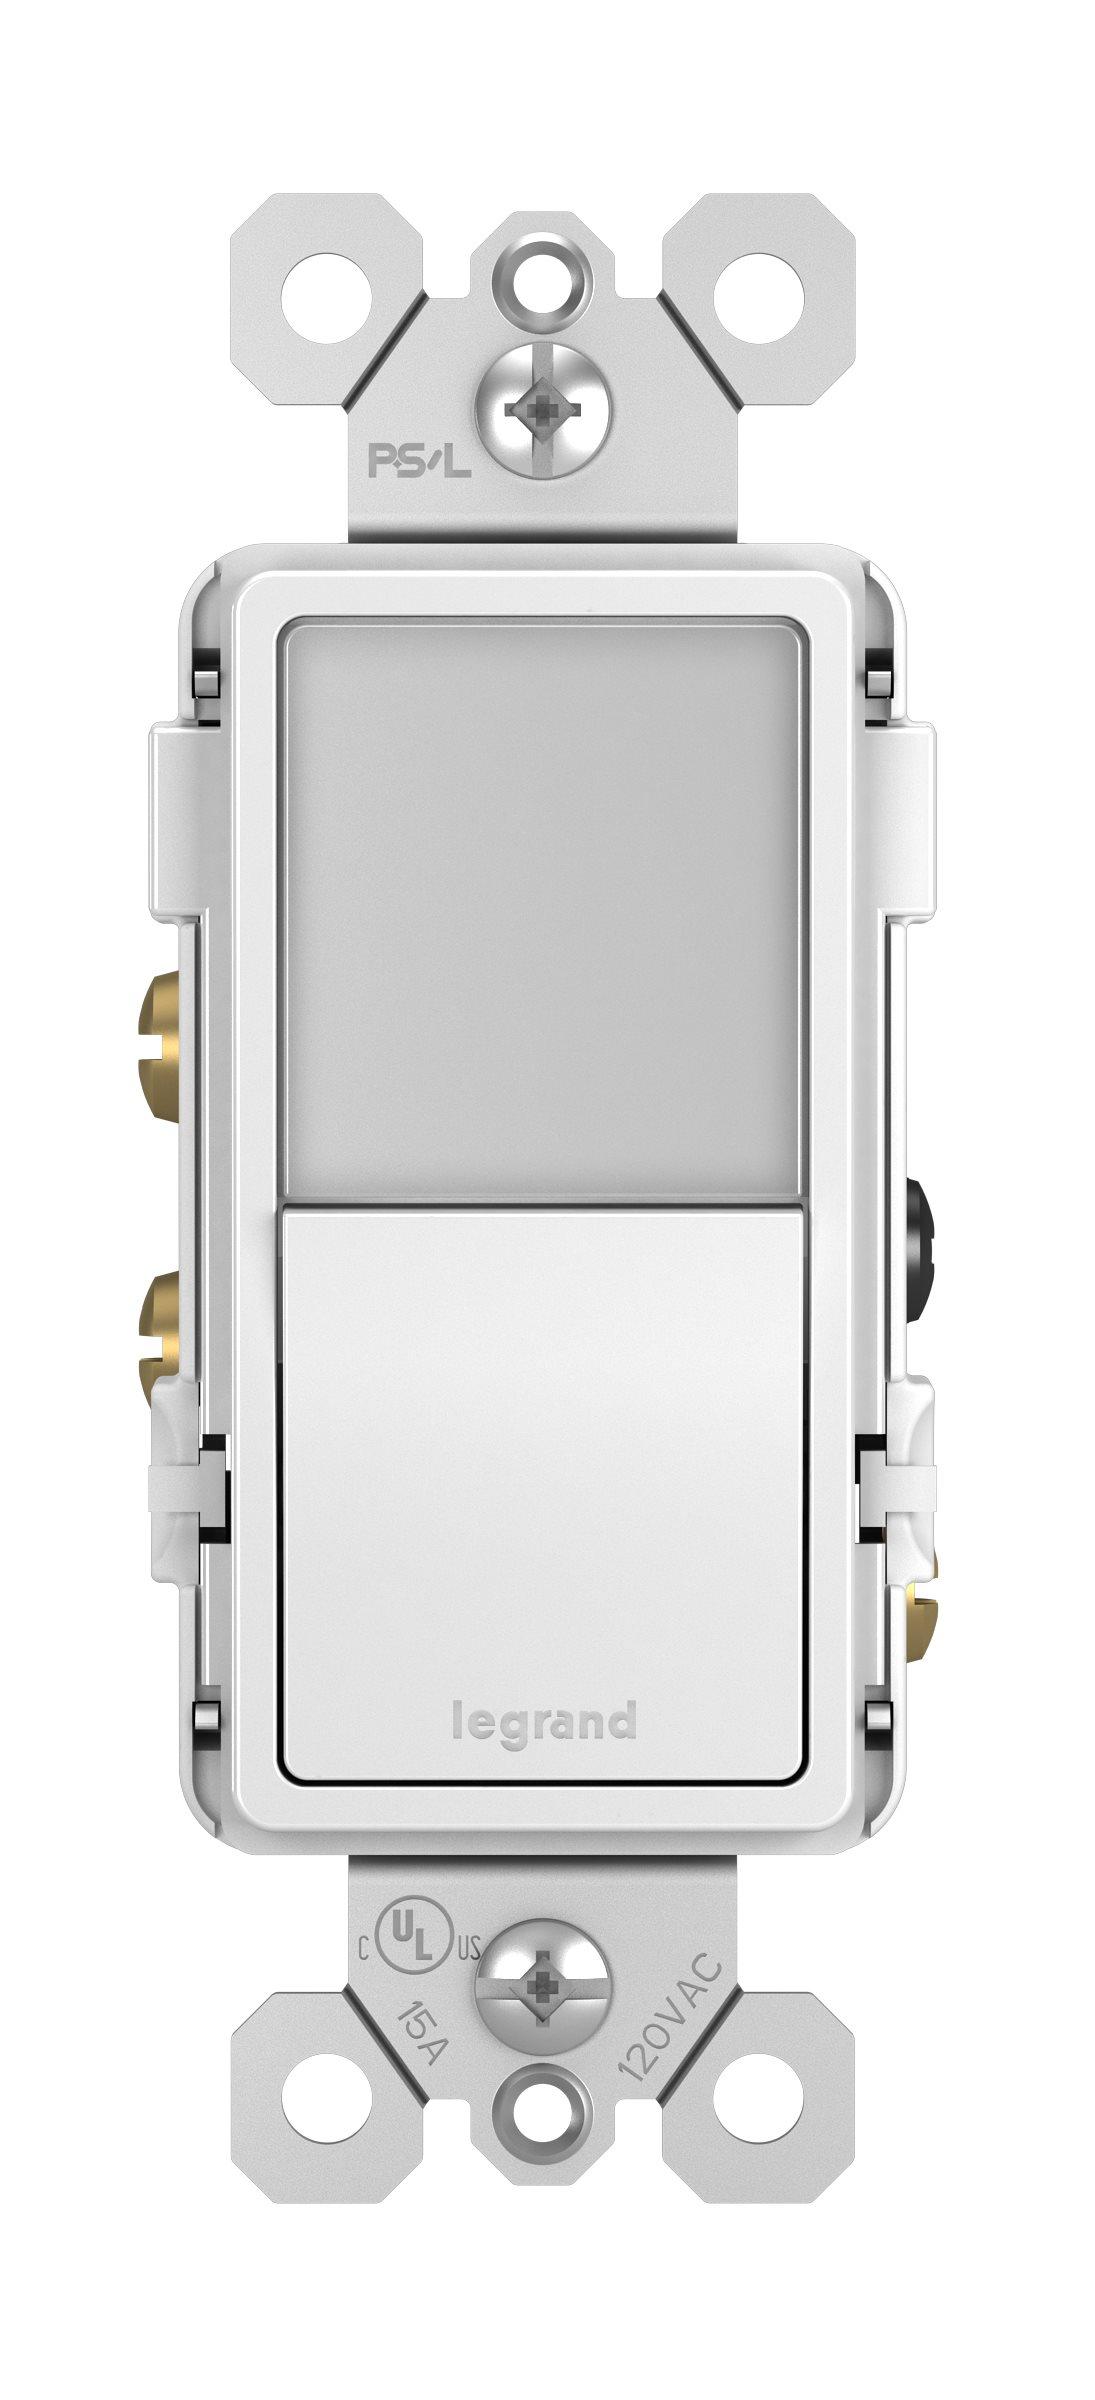 Legrand Radiant Night Light + Single Pole/3-Way Switch - White